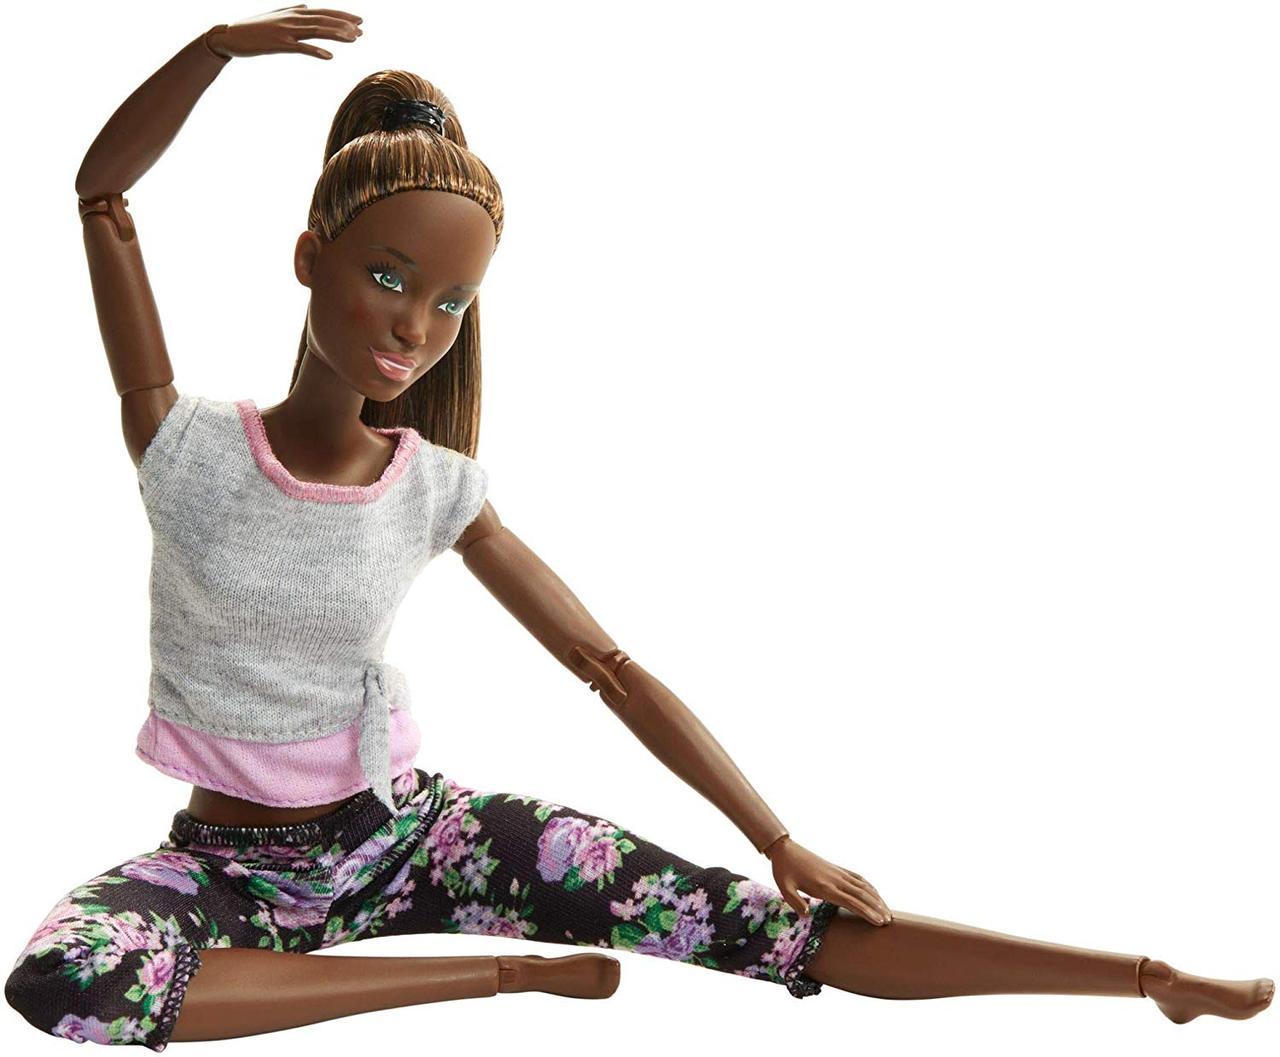 Кукла Барби йога афроамериканка безграничные движения Barbie Made to Move Doll Dark Hair FTG83